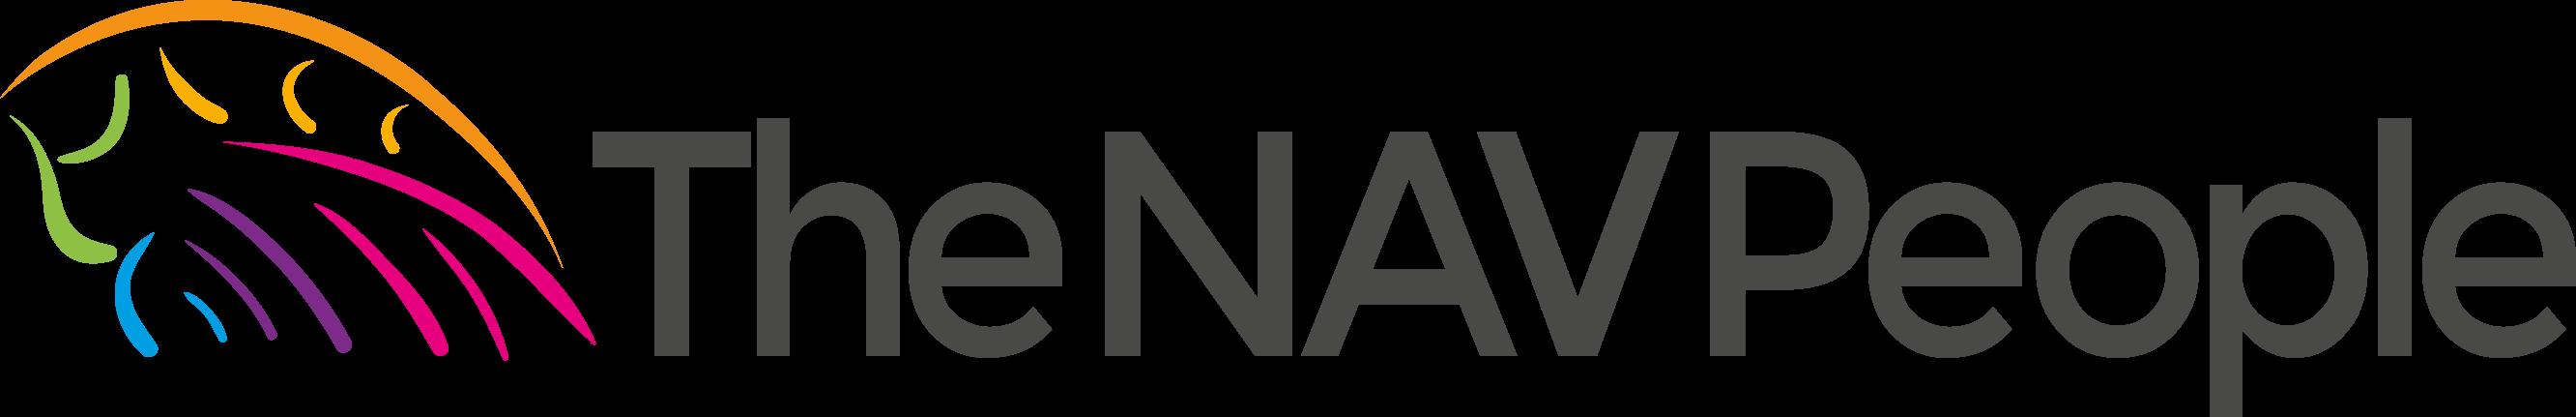 TNP_New Logo 2016 Grey text.png